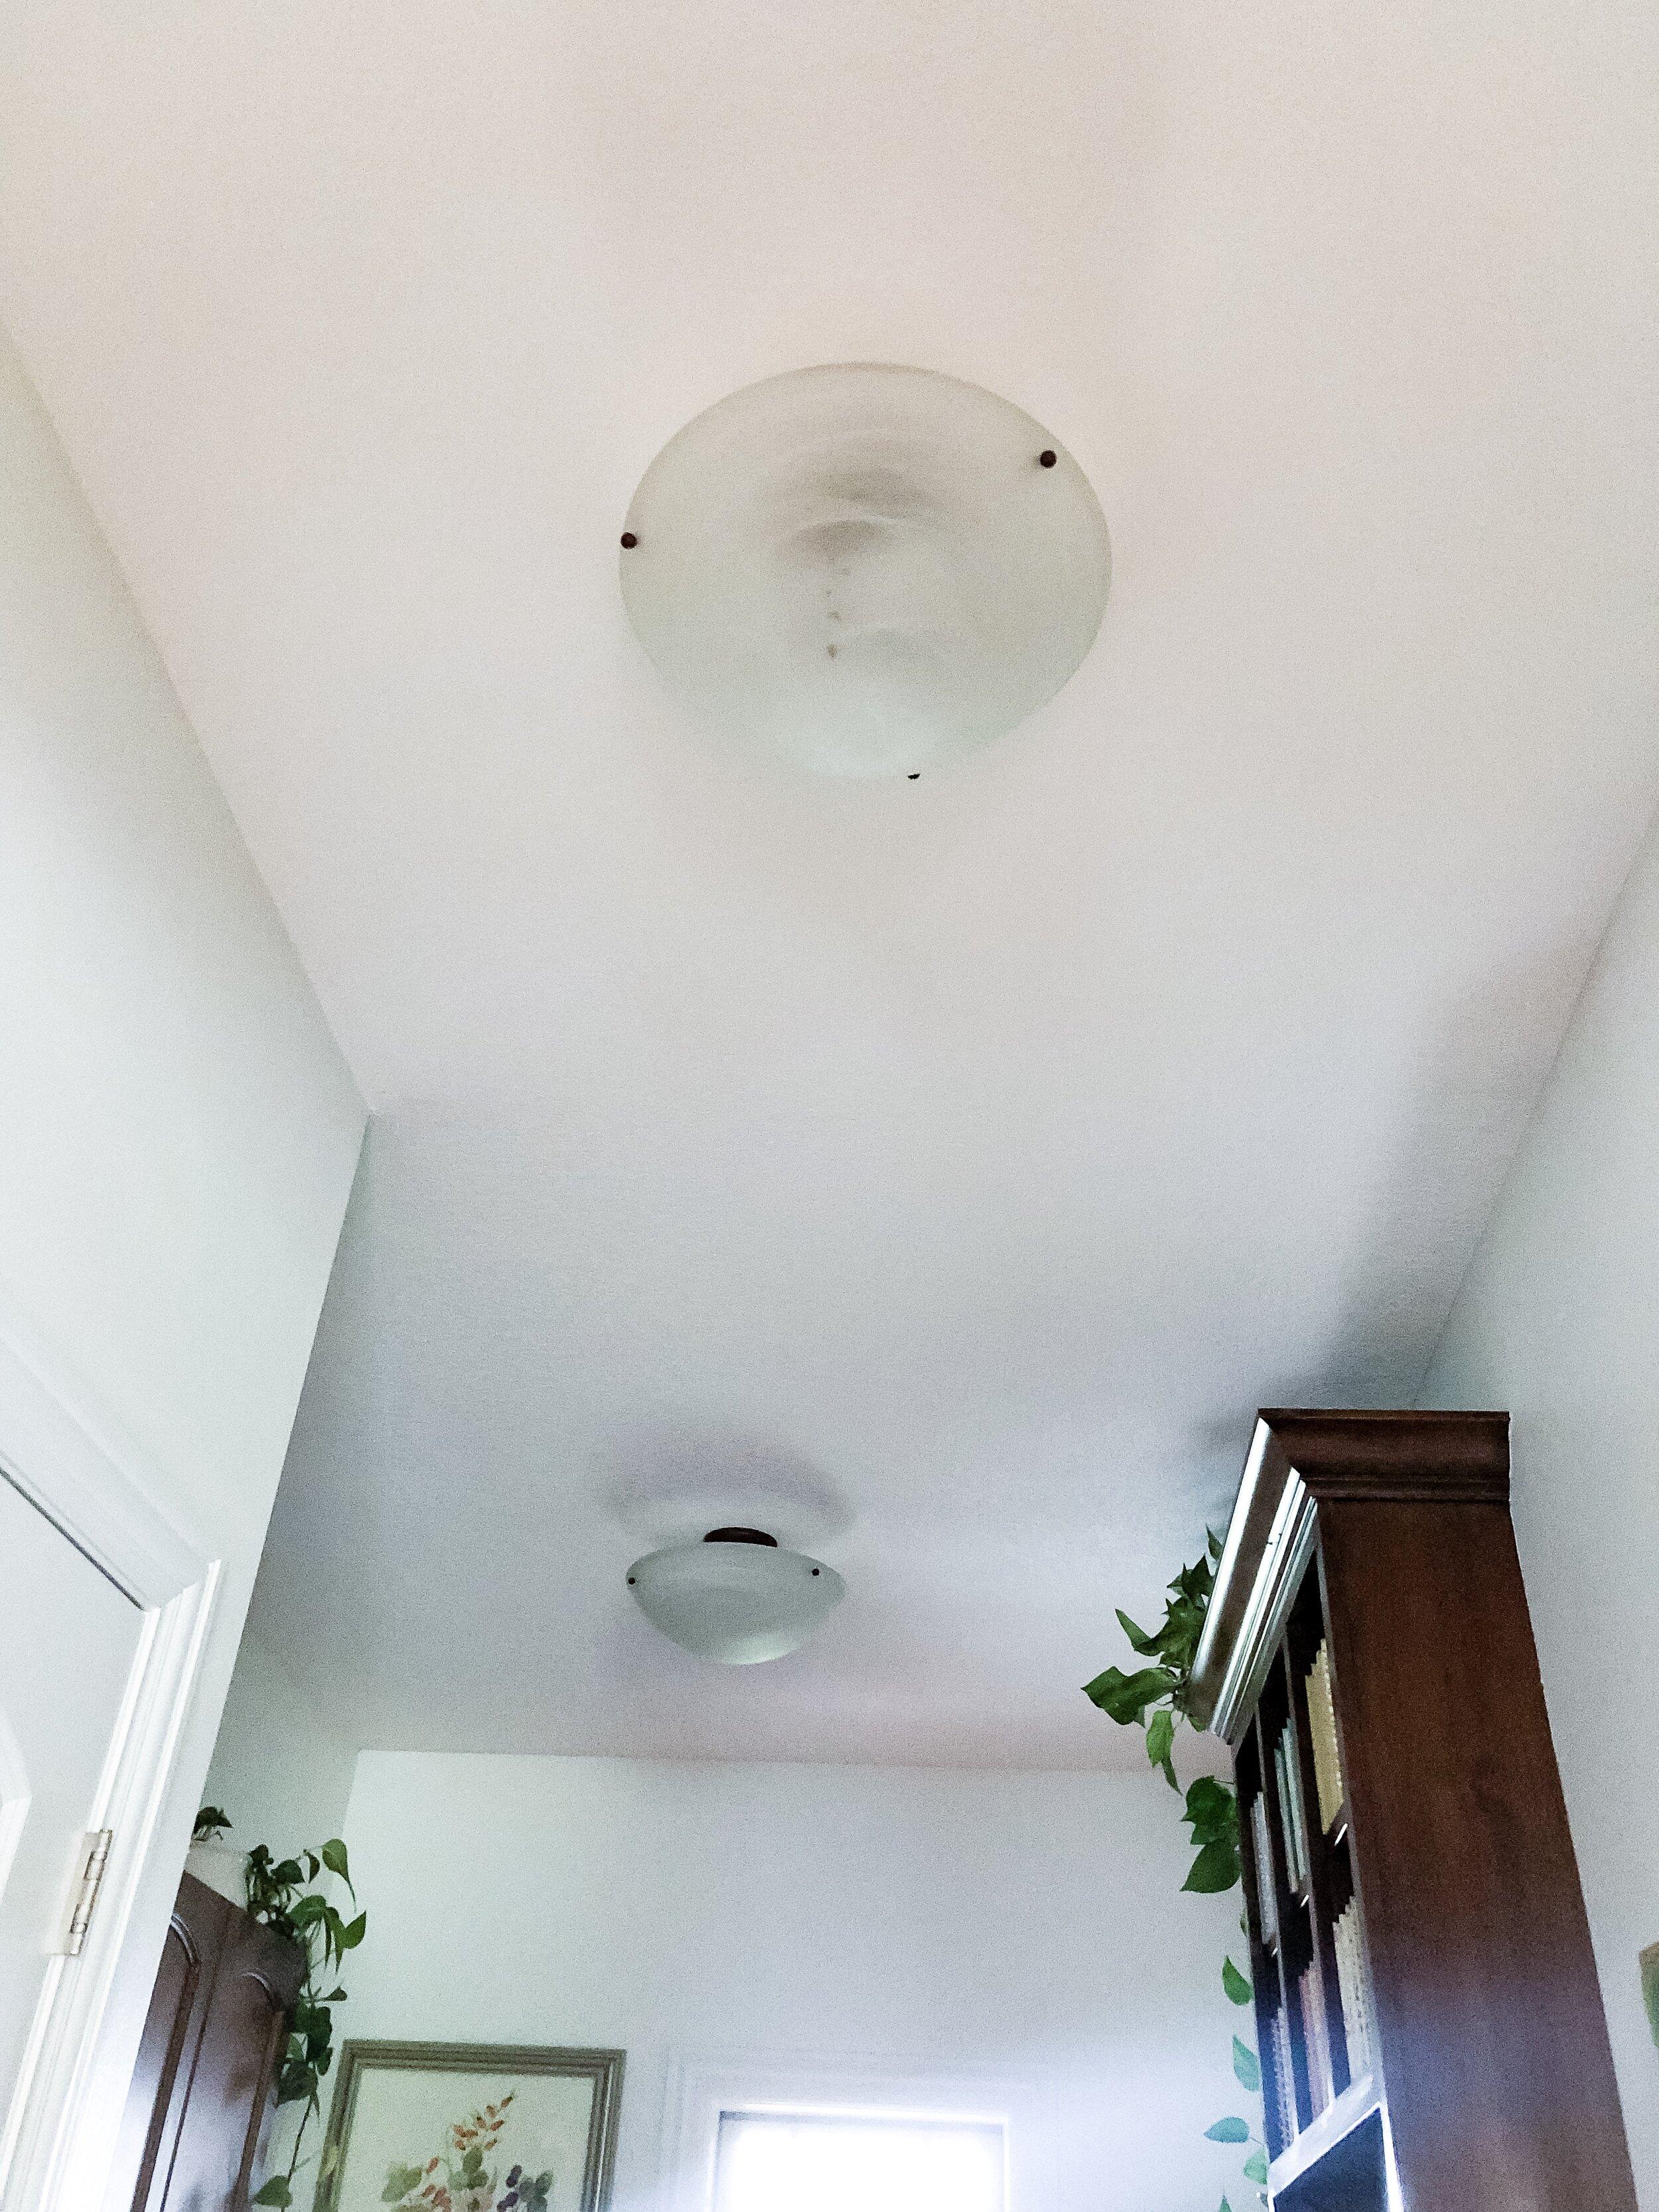 $5 Ceiling Light DIY Makeover from hprallandco.com   H. Prall & Co. Interior Decorating   Des Moines, IA